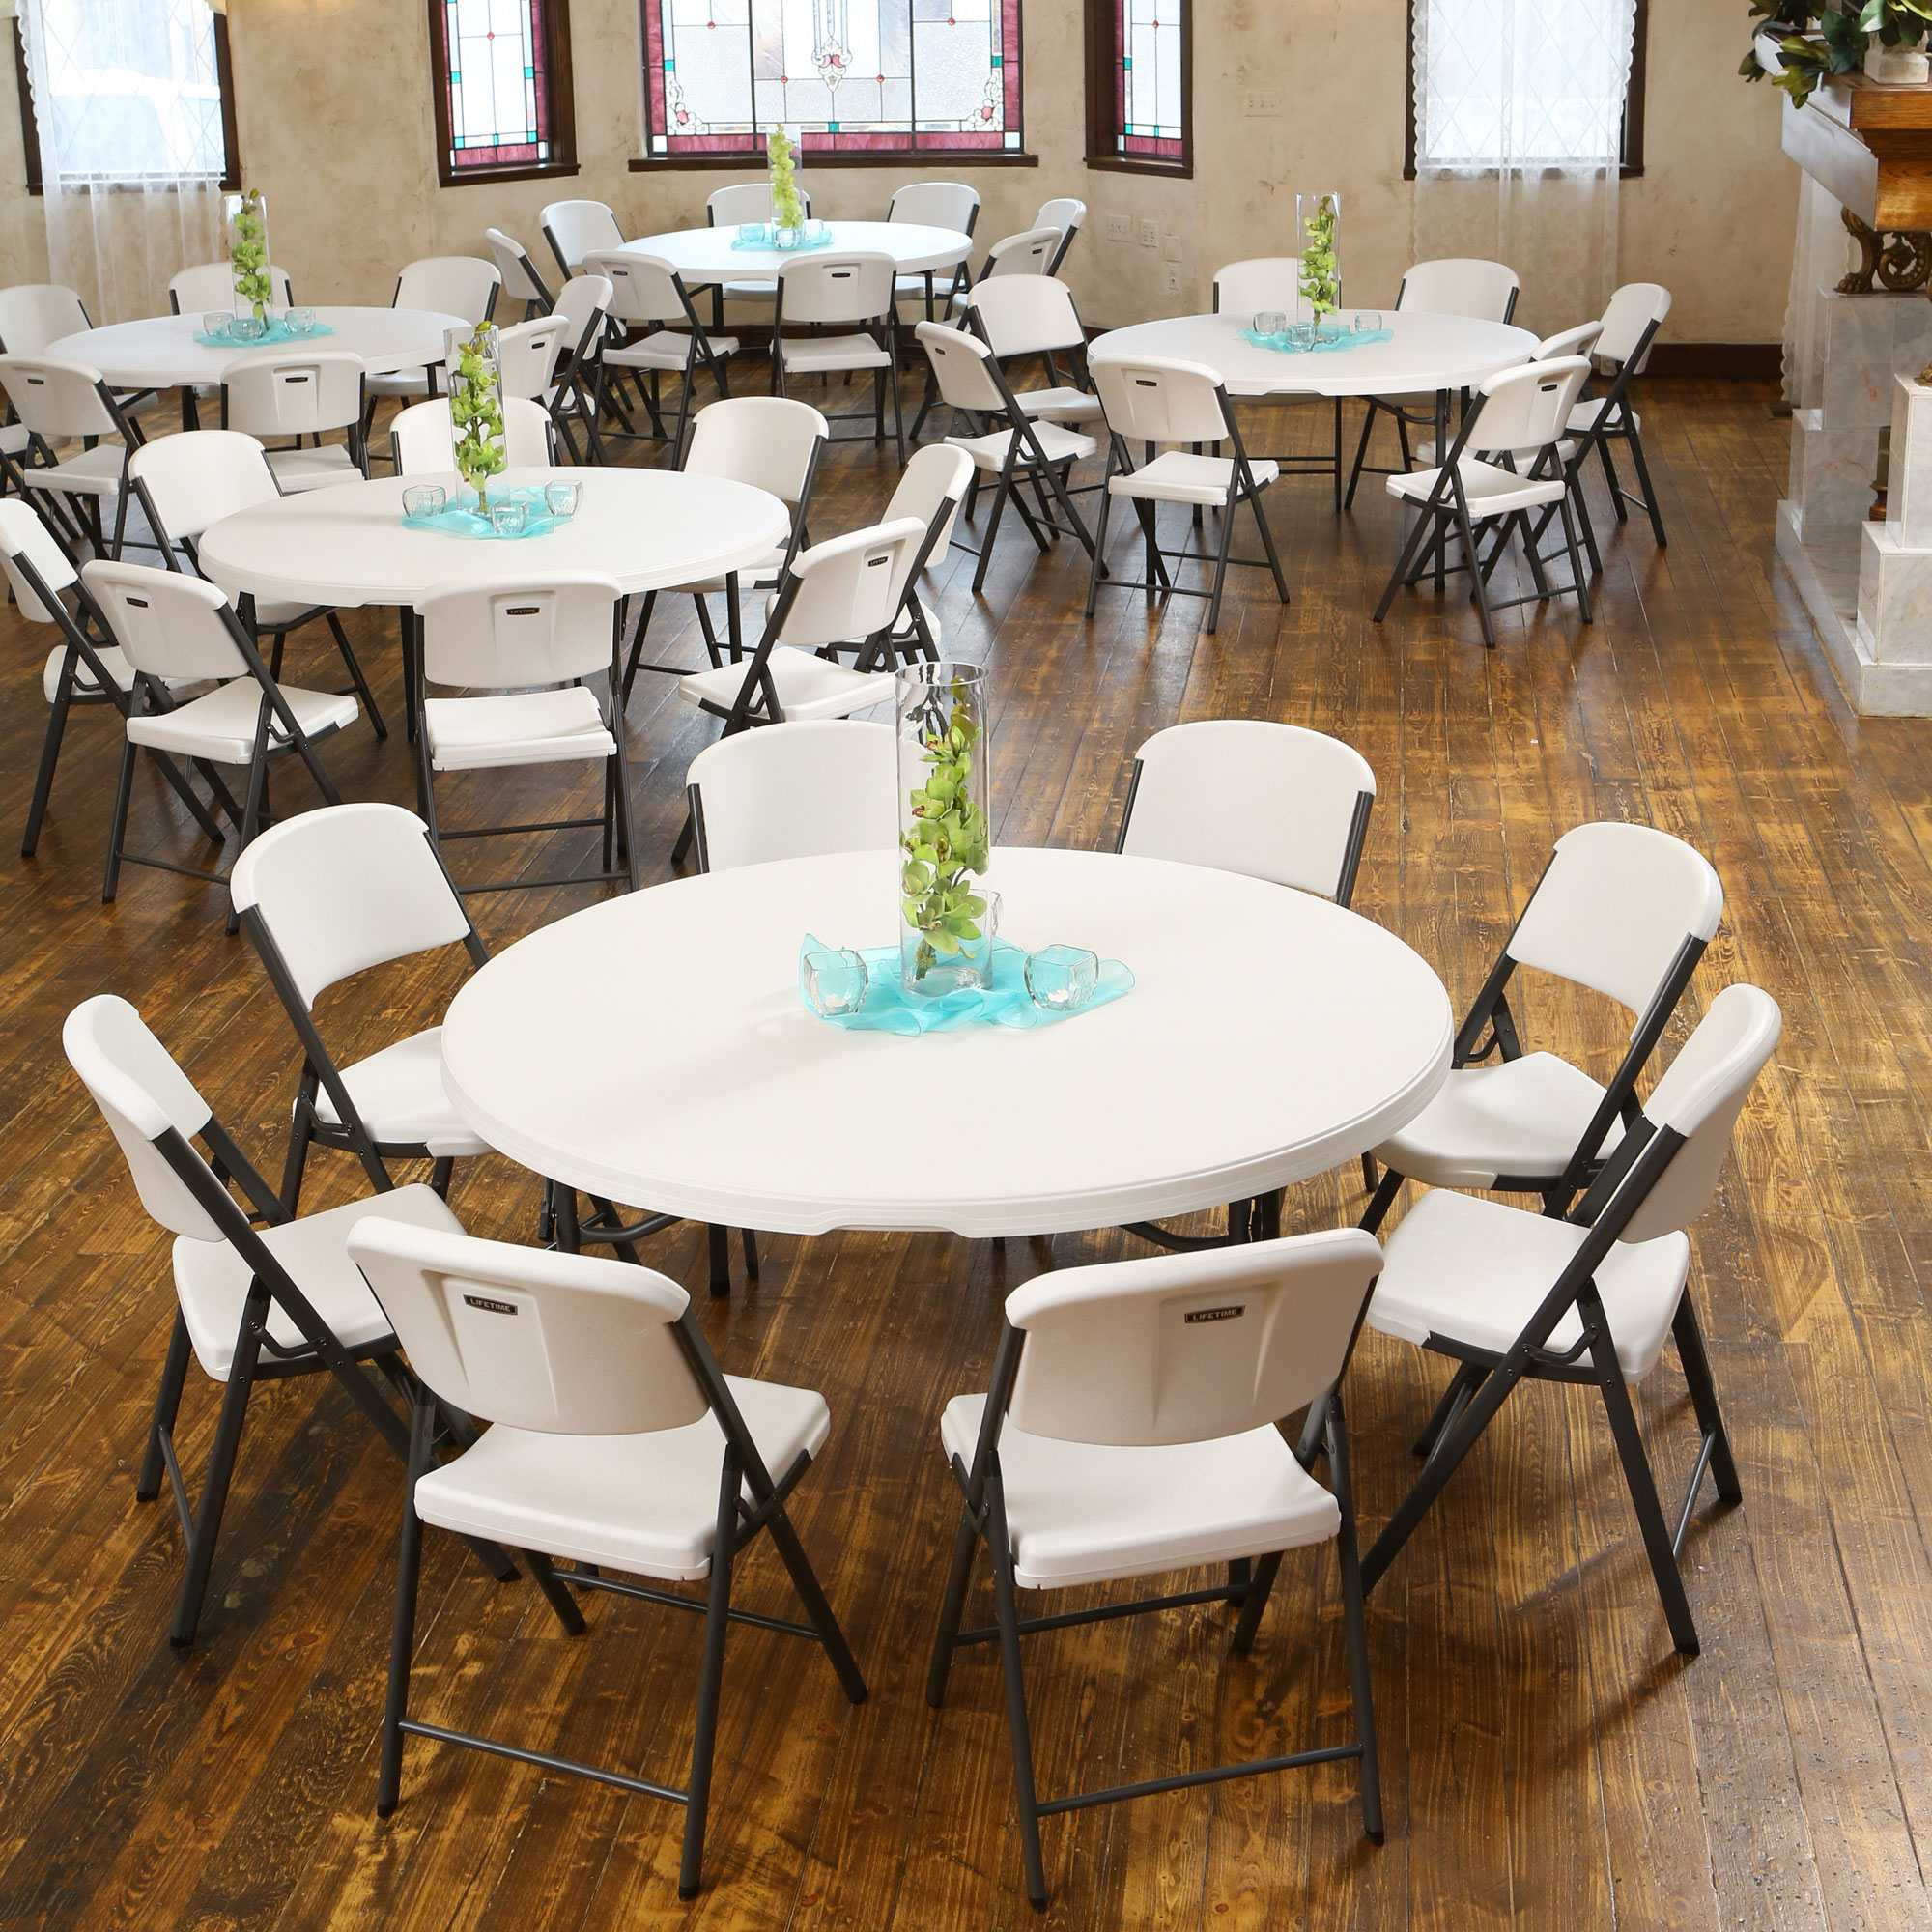 Rent chairs, Tables, Moonwalks